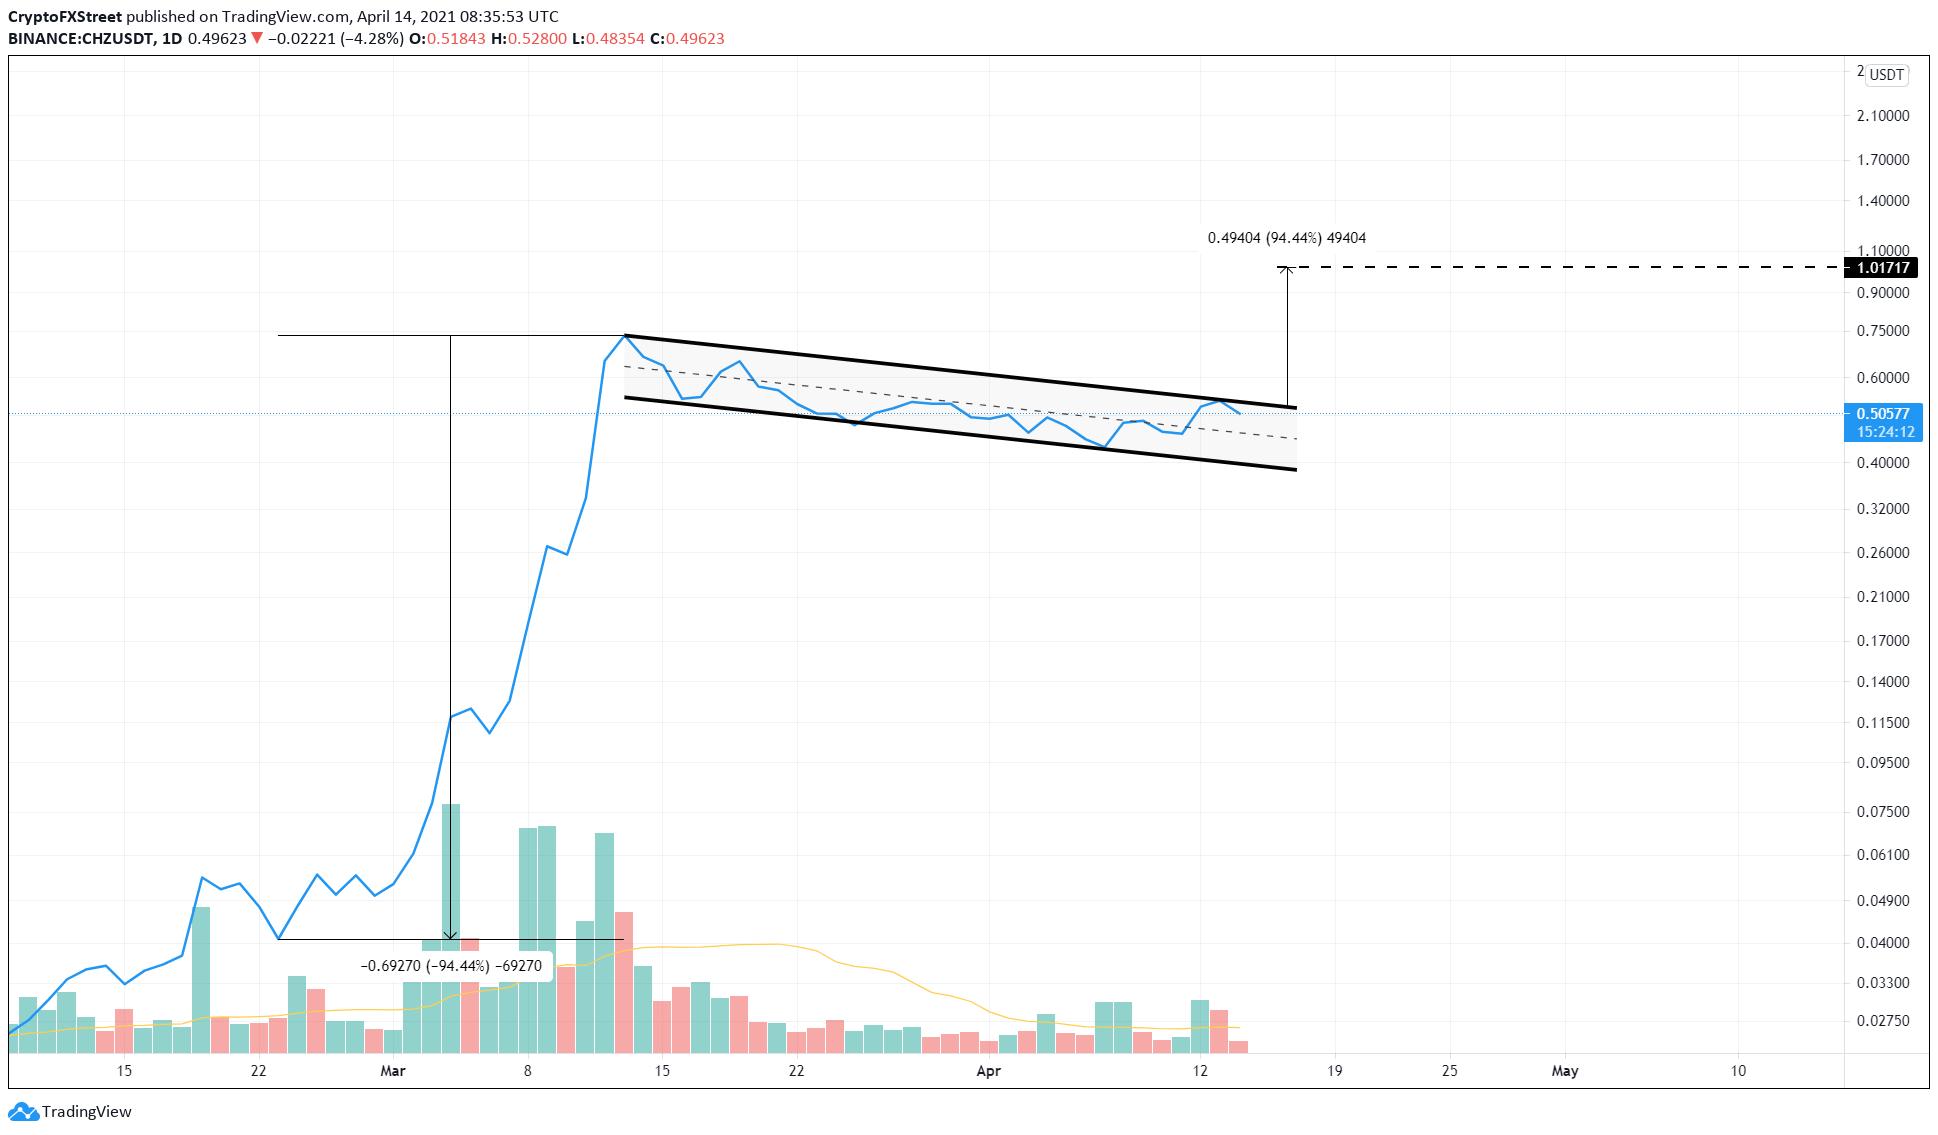 CHZ/USDT 12-hour chart